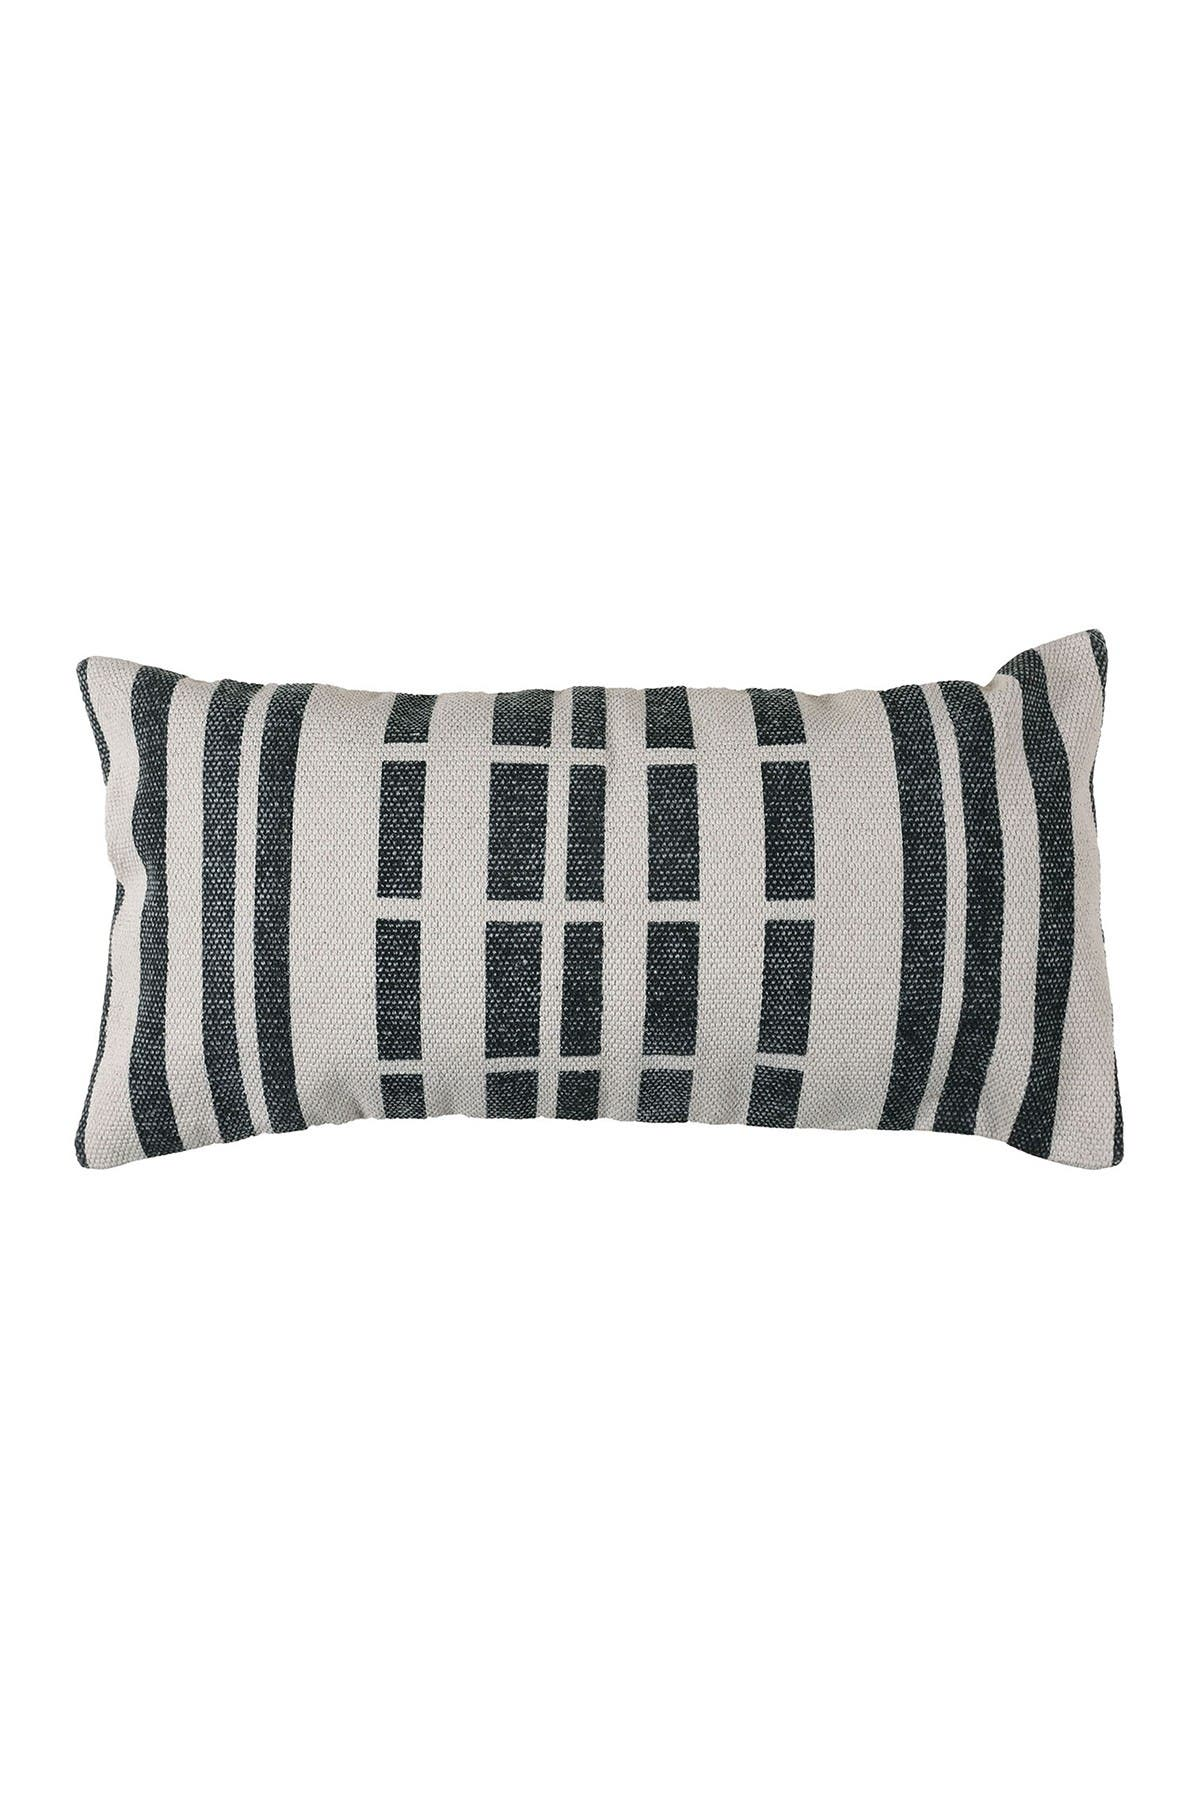 Image of HOMART Block Print Lumbar Pillow 12x24 - Broken Stripe